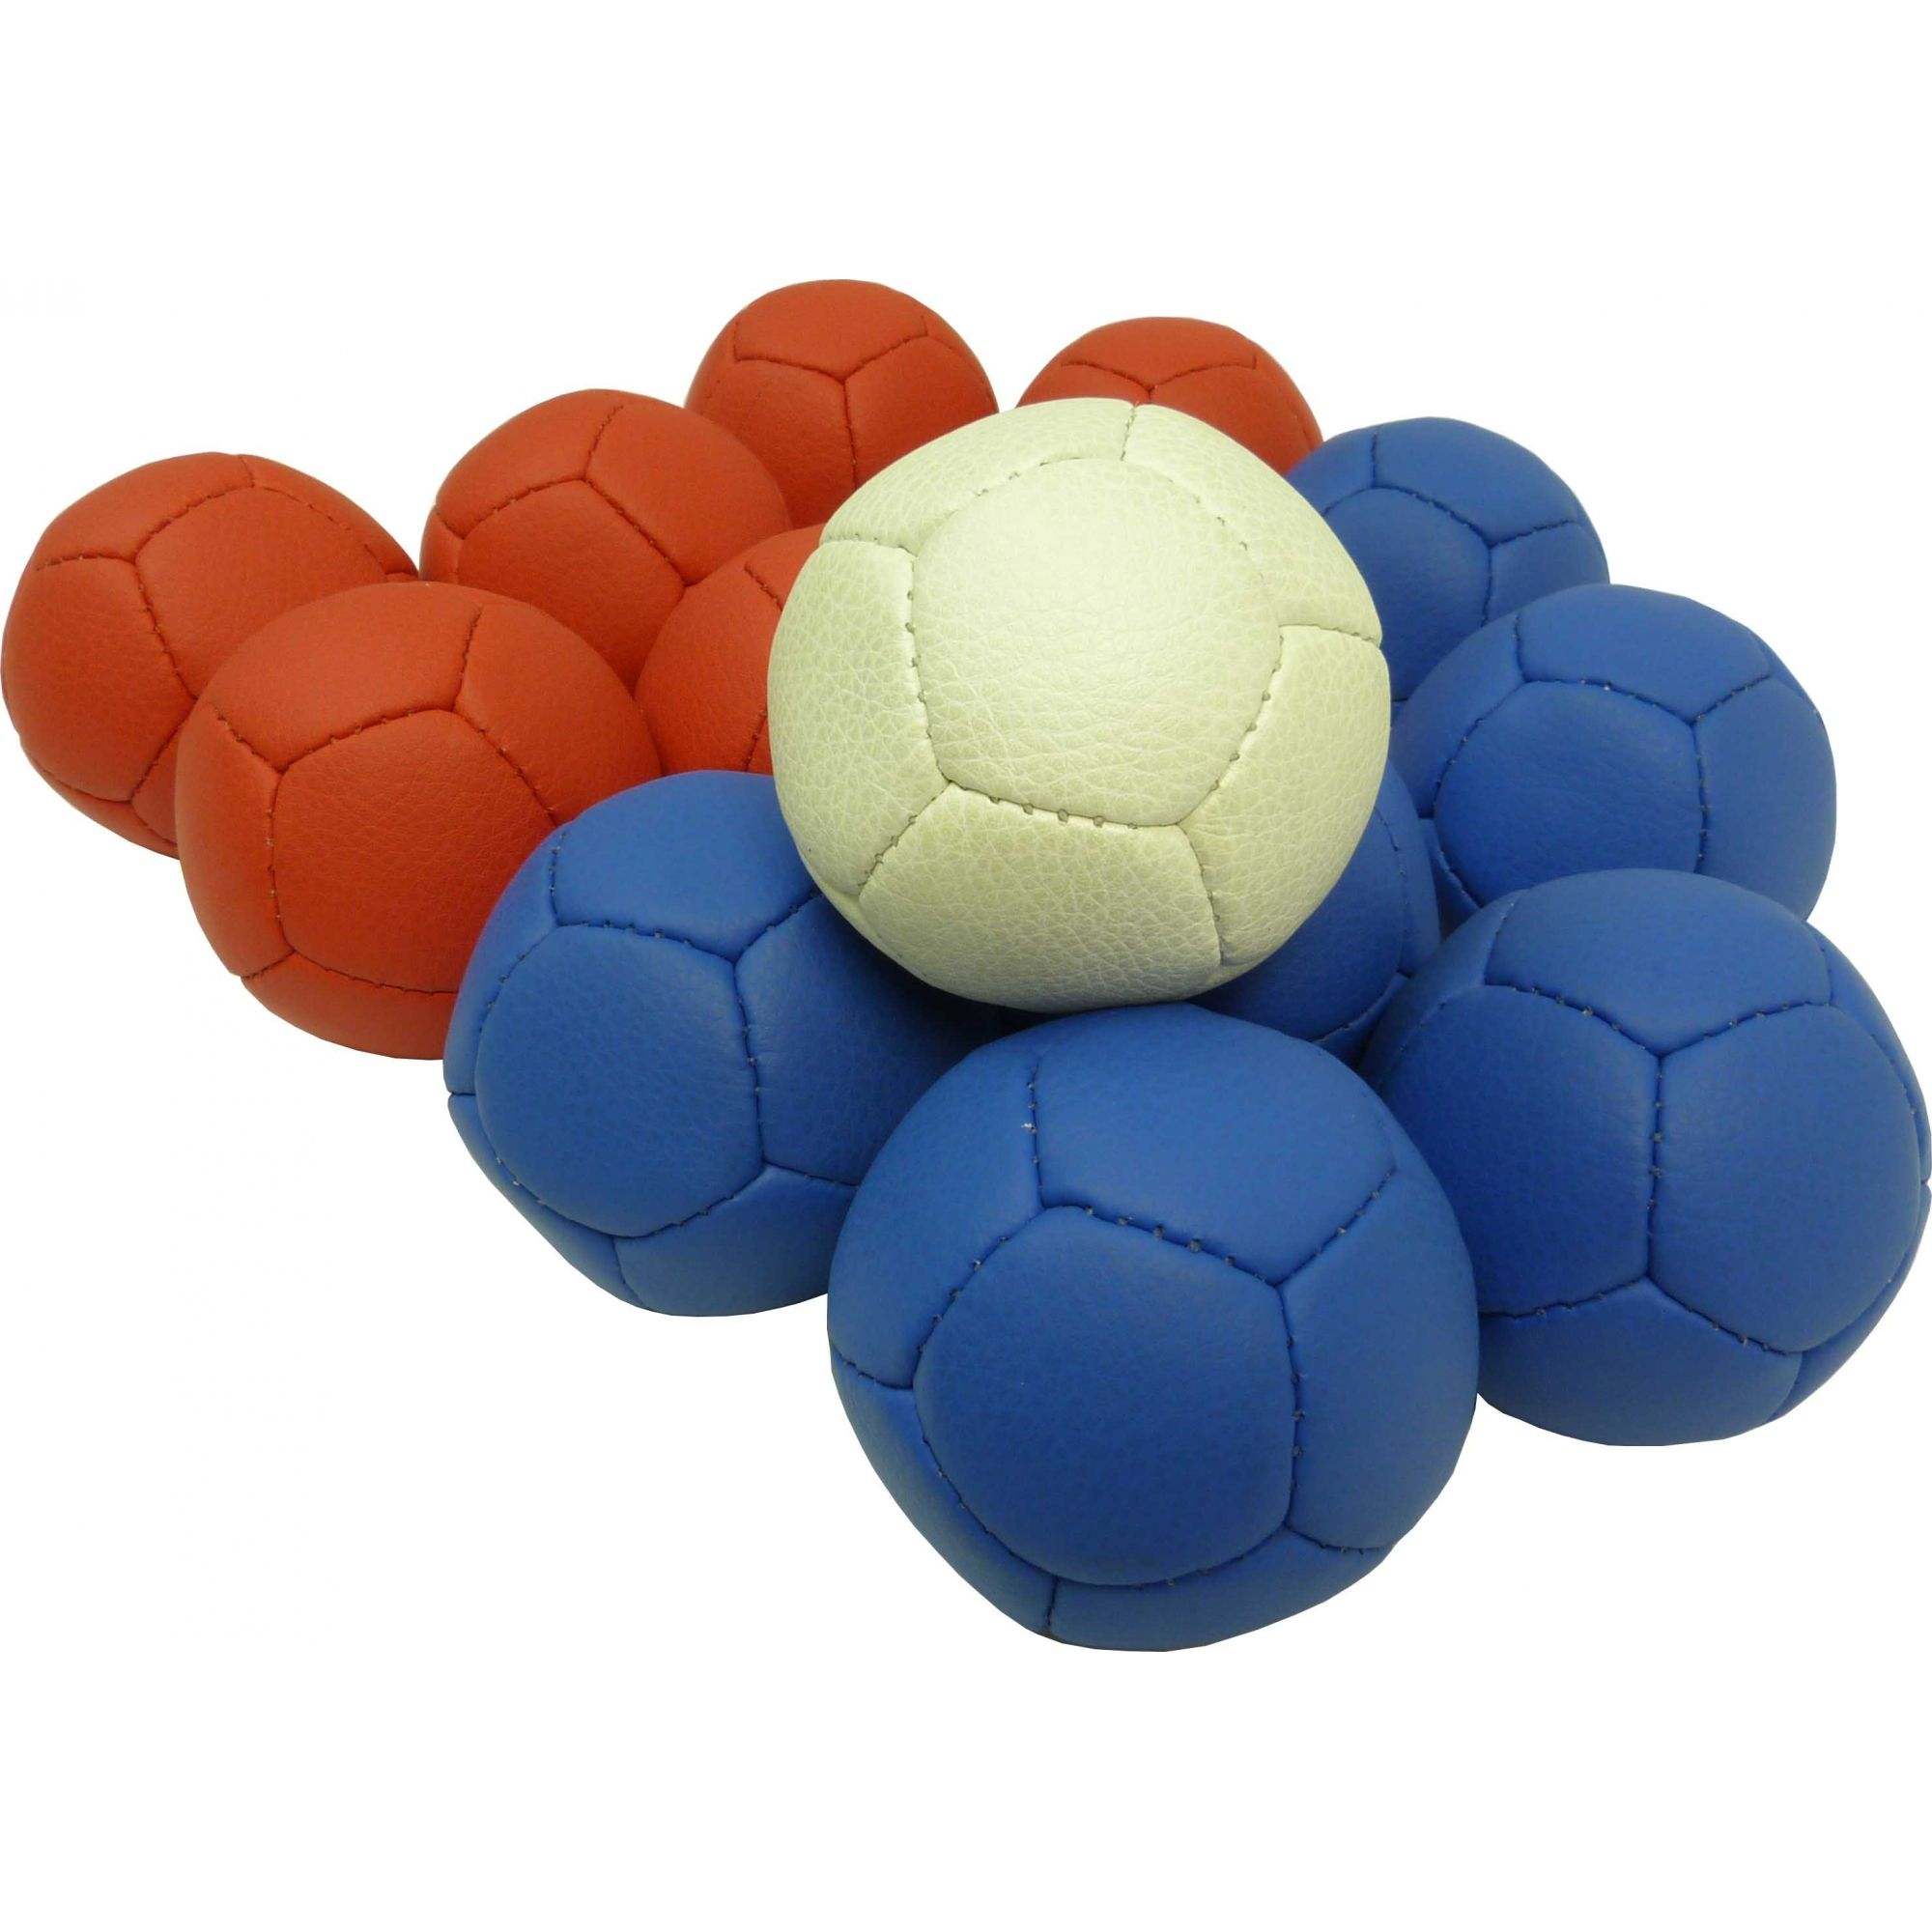 Jogo de Bocha Adaptado Standard Handi Life Sports